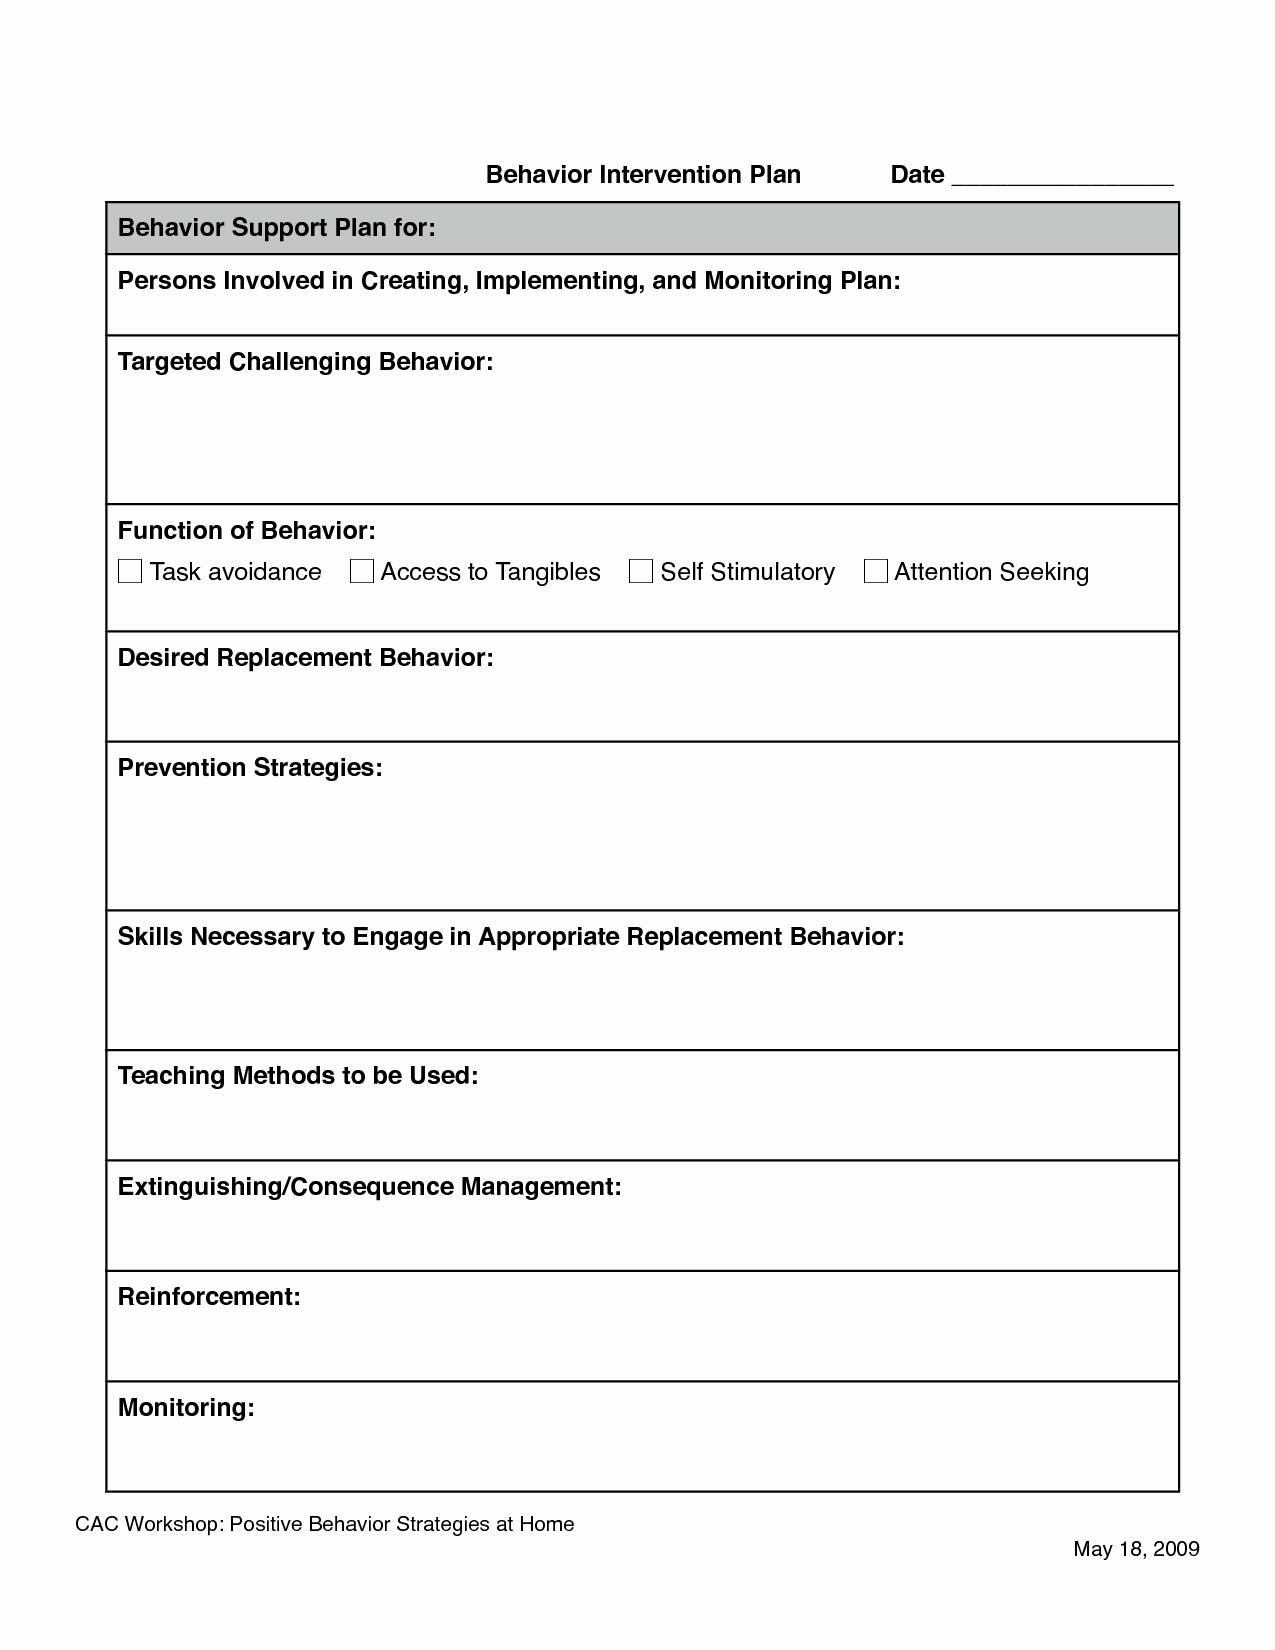 Behavior Intervention Plan Template